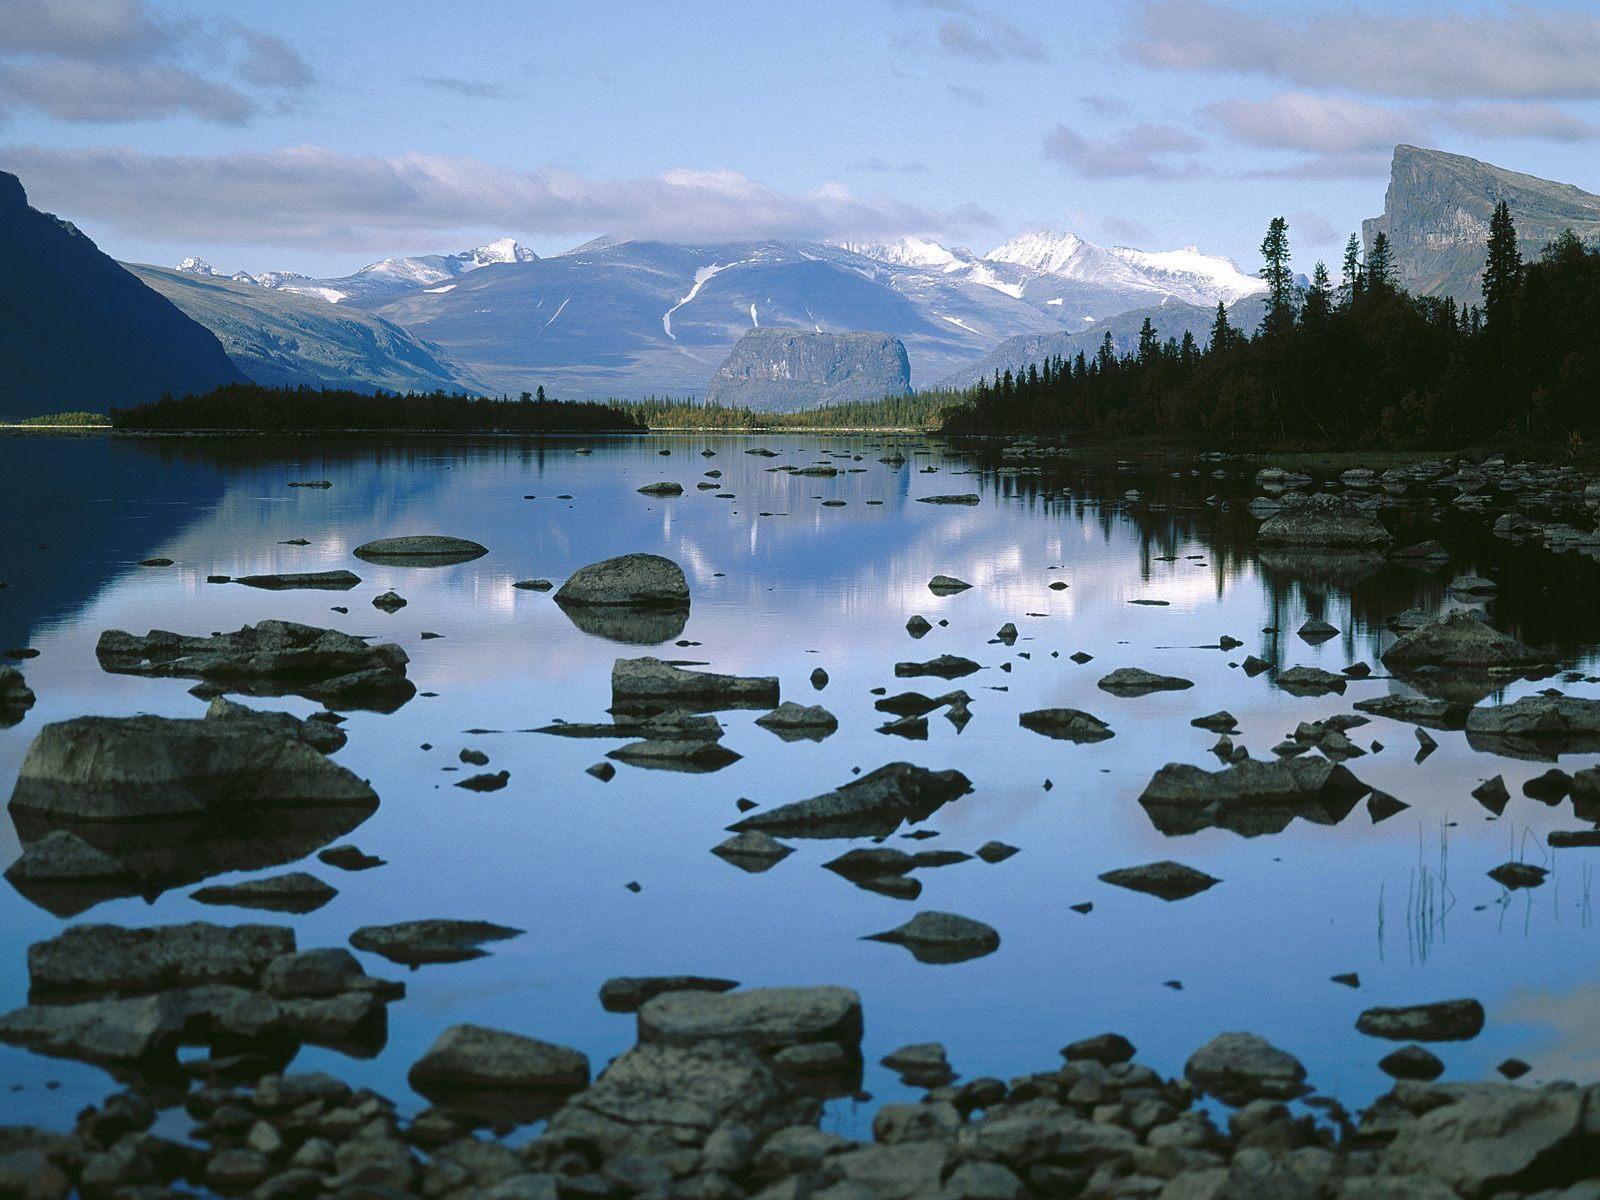 http://1.bp.blogspot.com/-OzsLmhnMOgk/TrvYOJz9O4I/AAAAAAAABFM/fb6epGFZLAw/s1600/Laitaure+Lake%252C+Sarek+National+Park%252C+Sweden.jpg